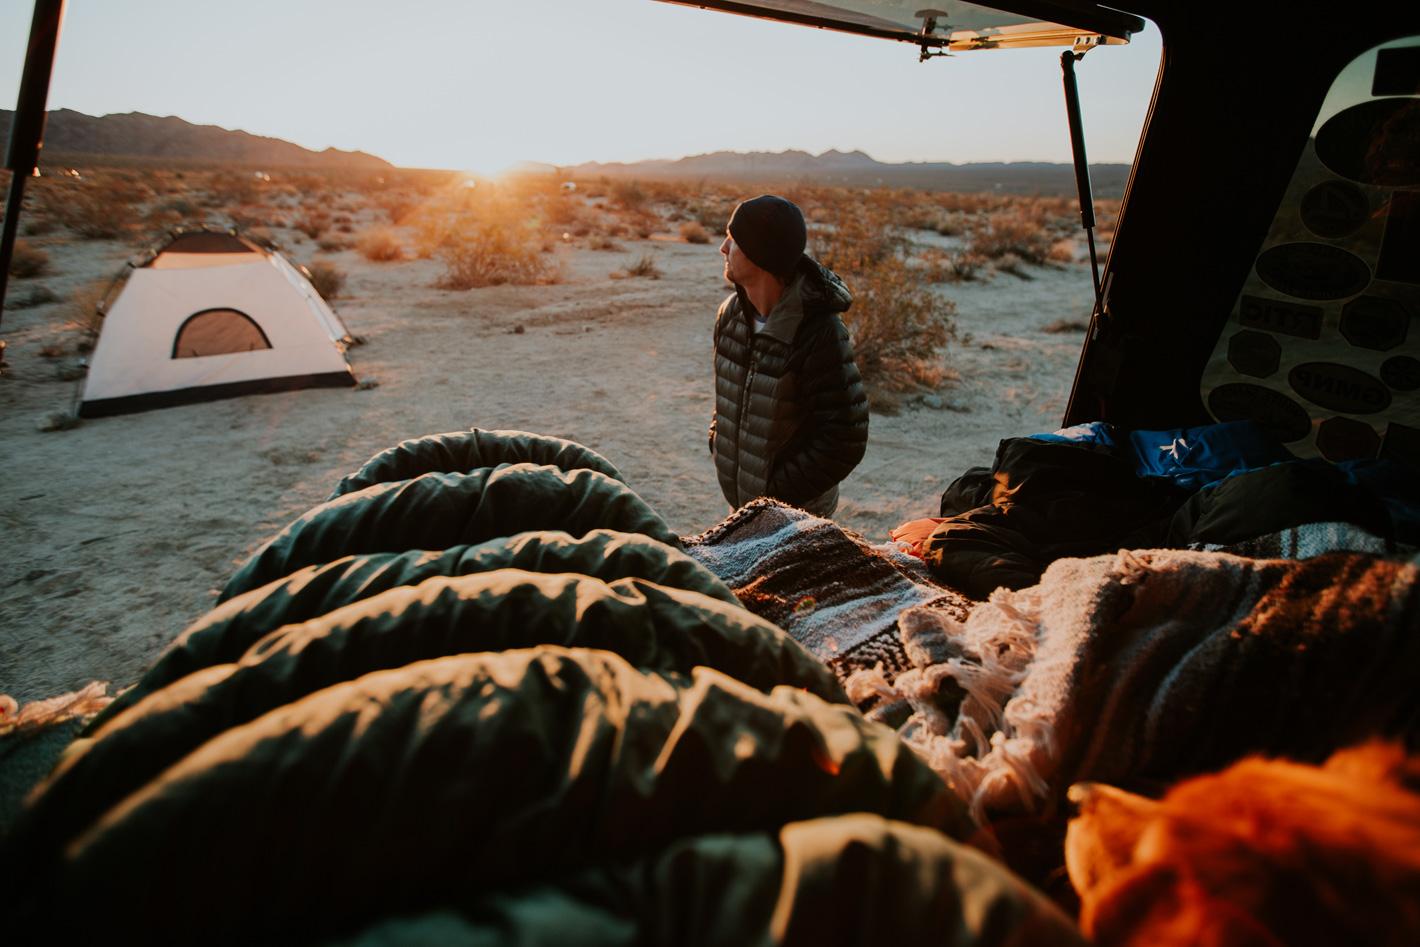 CindyGiovagnoli_Joshua_Tree_National_Park_California_Mojave_Desert_Cholla_Garden_Hidden_Valley_climbing_hiking_camping-026.jpg